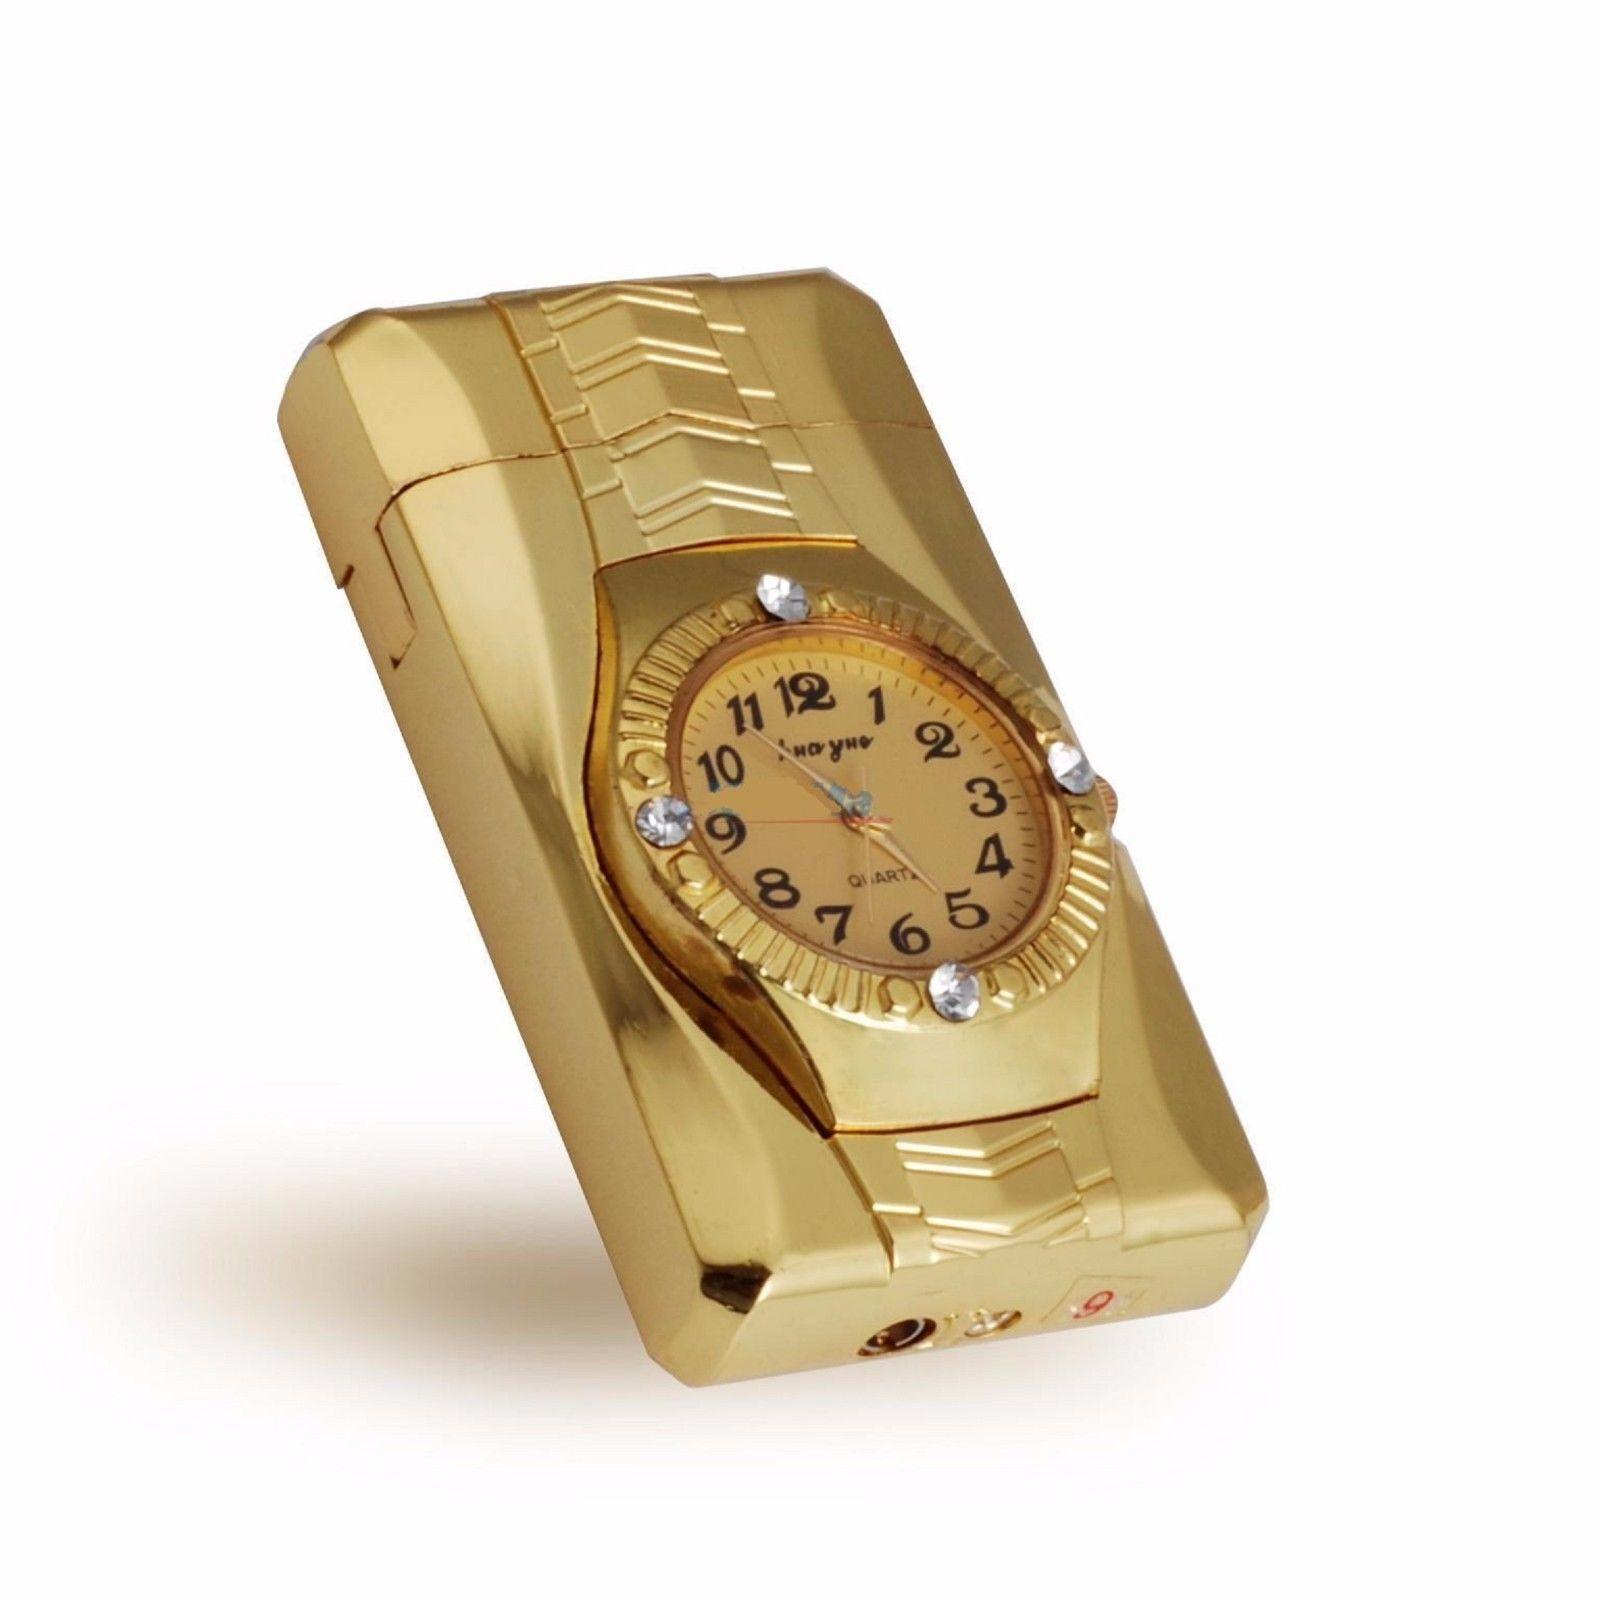 Luxury Golden Watch Shaped Windproof Butane Refillable Cigarette Cigar Lighter